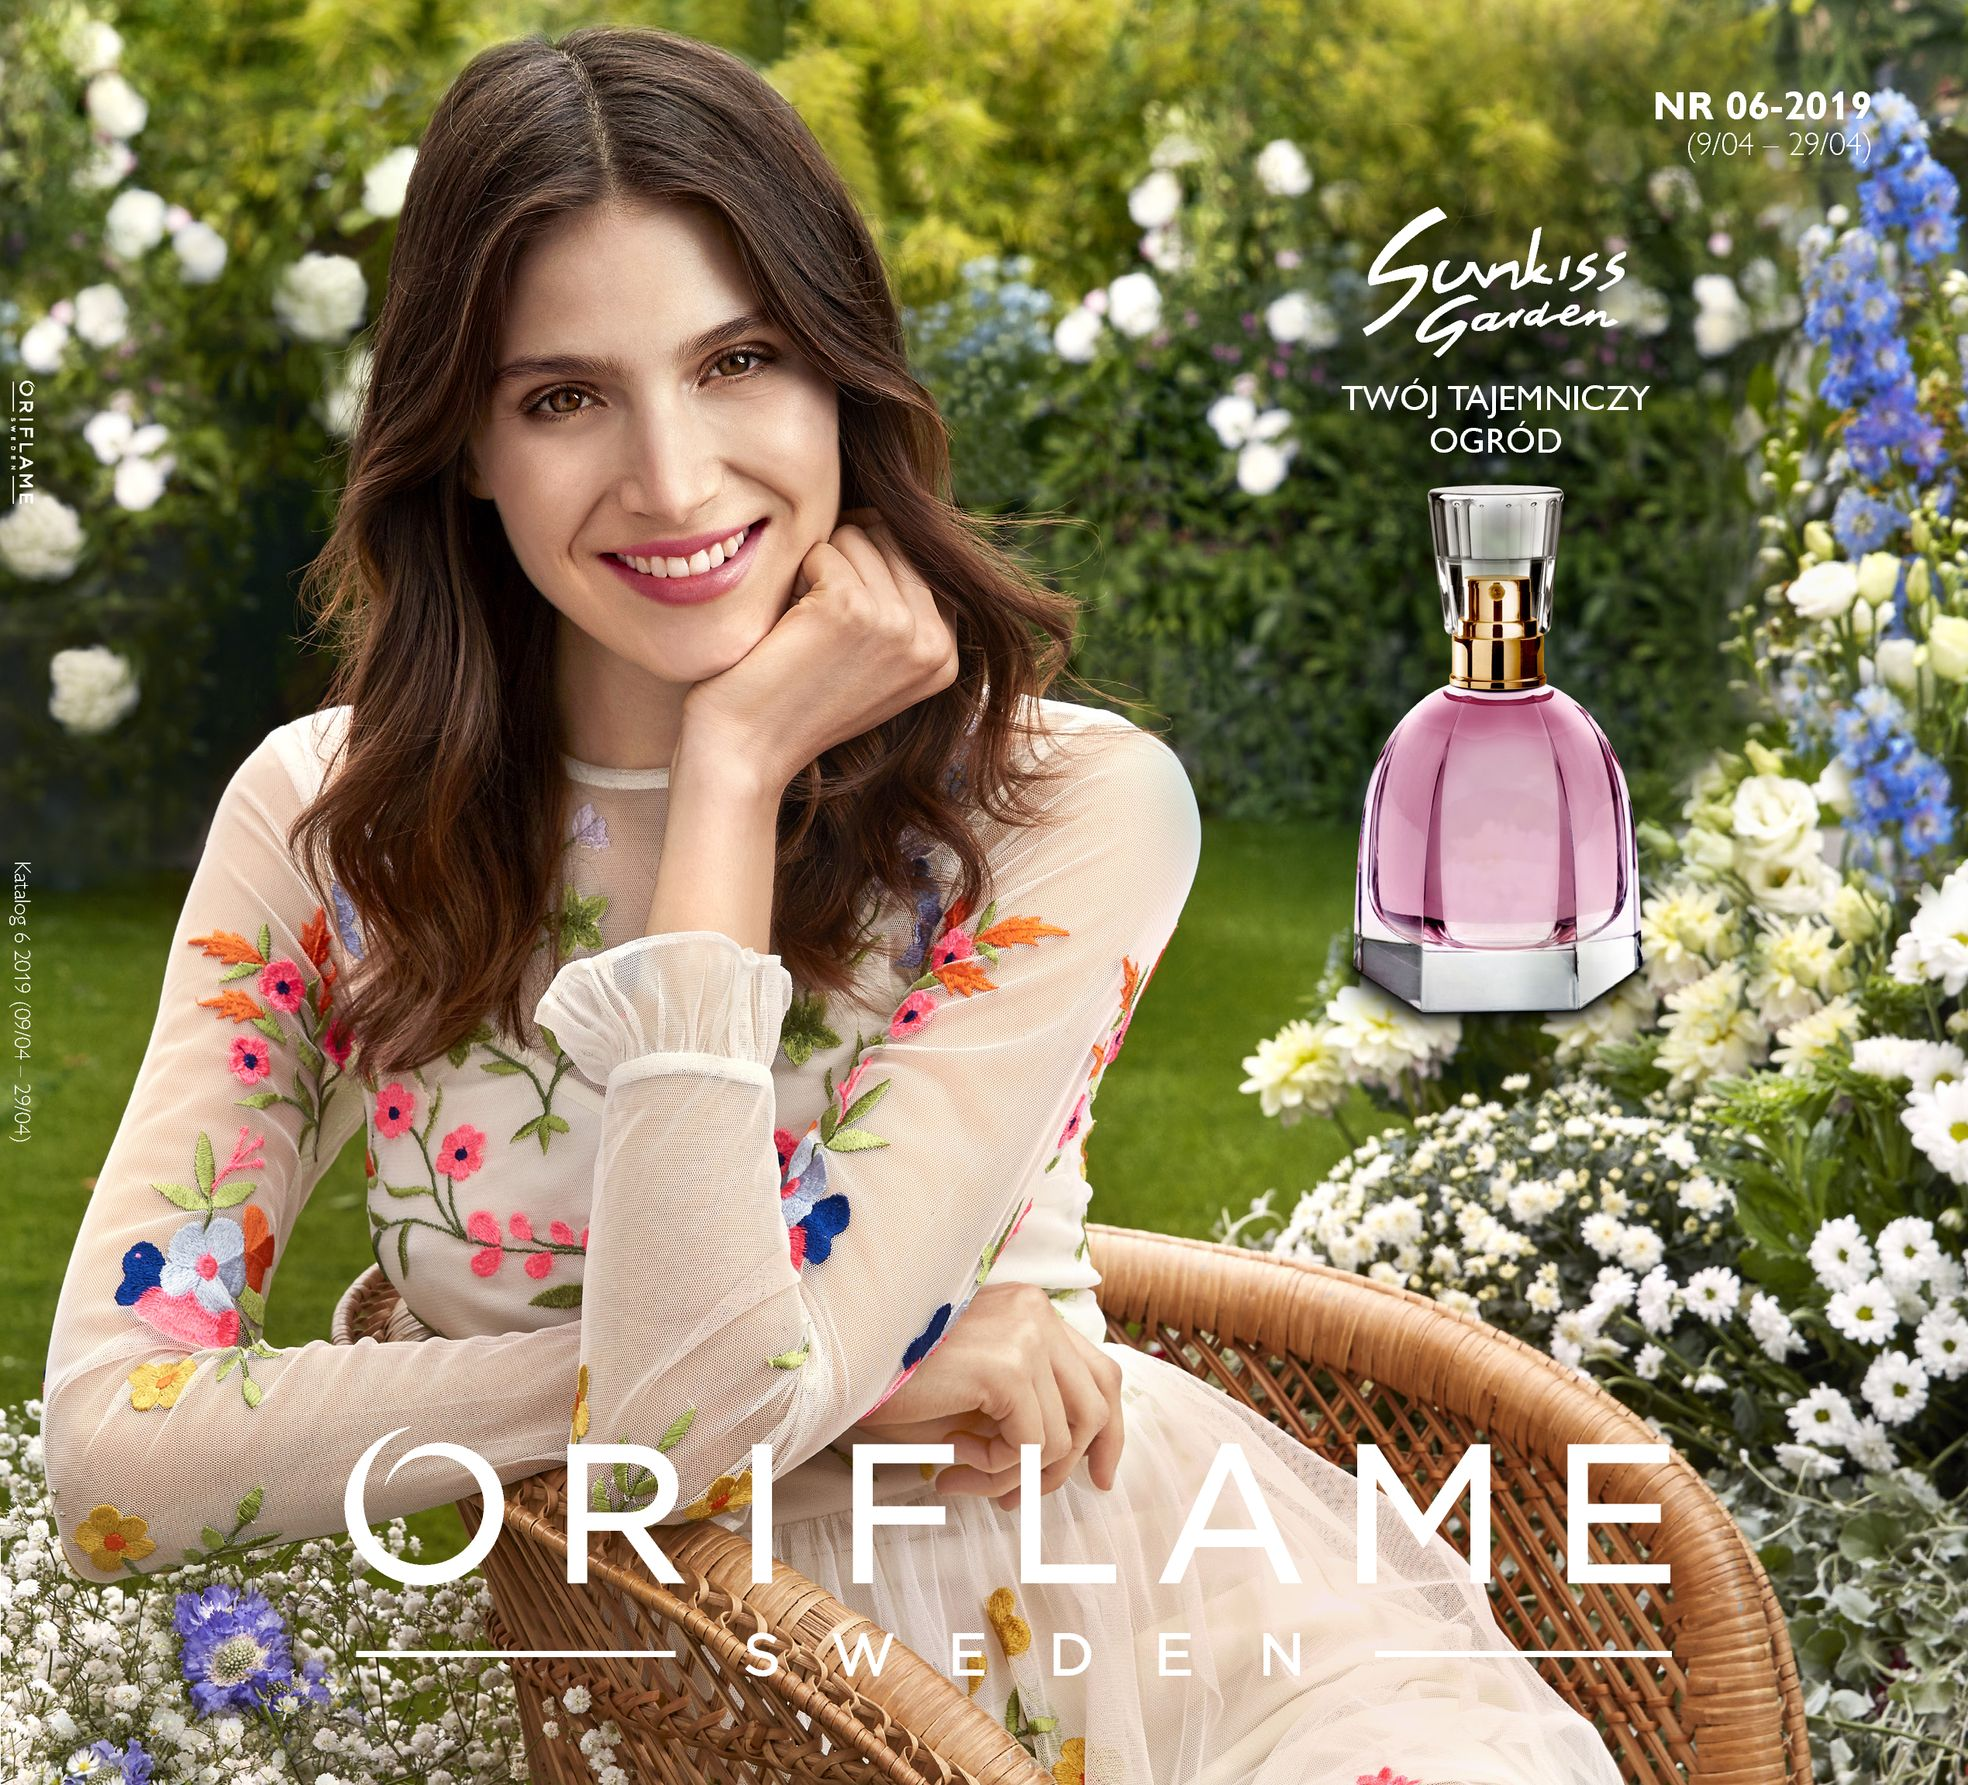 Następny katalog Oriflame 6/2019 Katalog 06/2019 9.04.2019